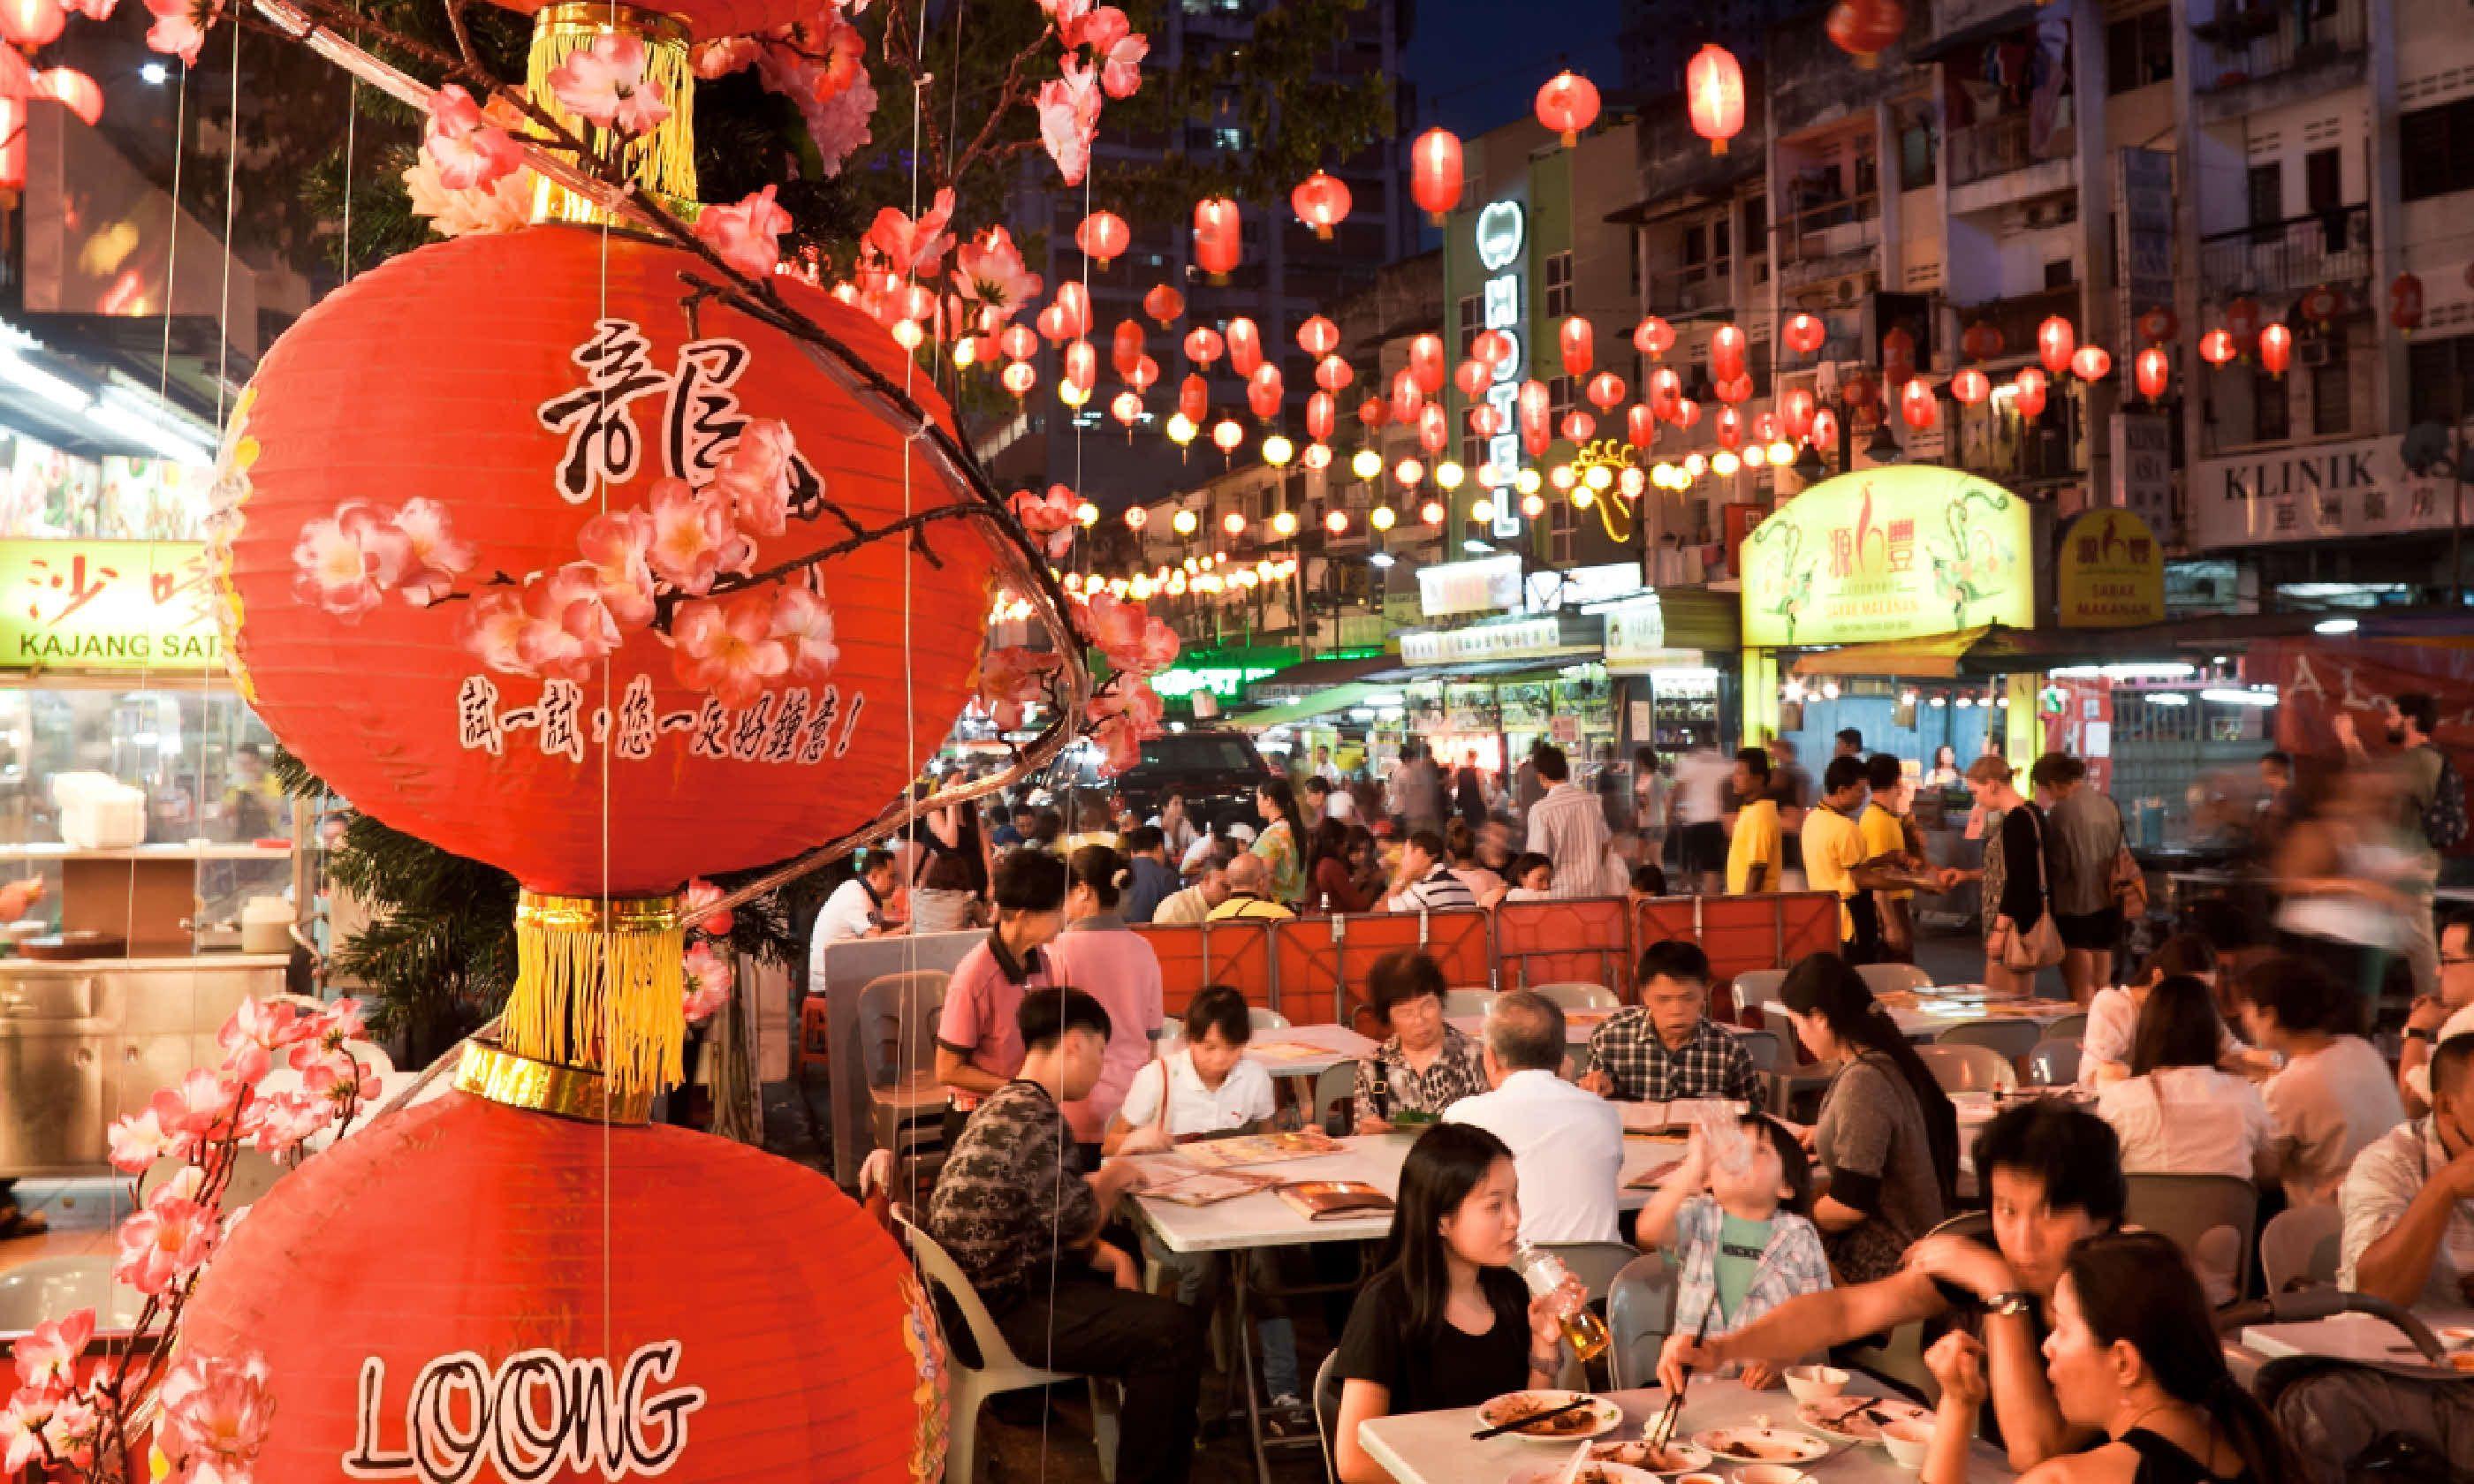 Street restaurant in Kuala Lumpur (Shutterstock)